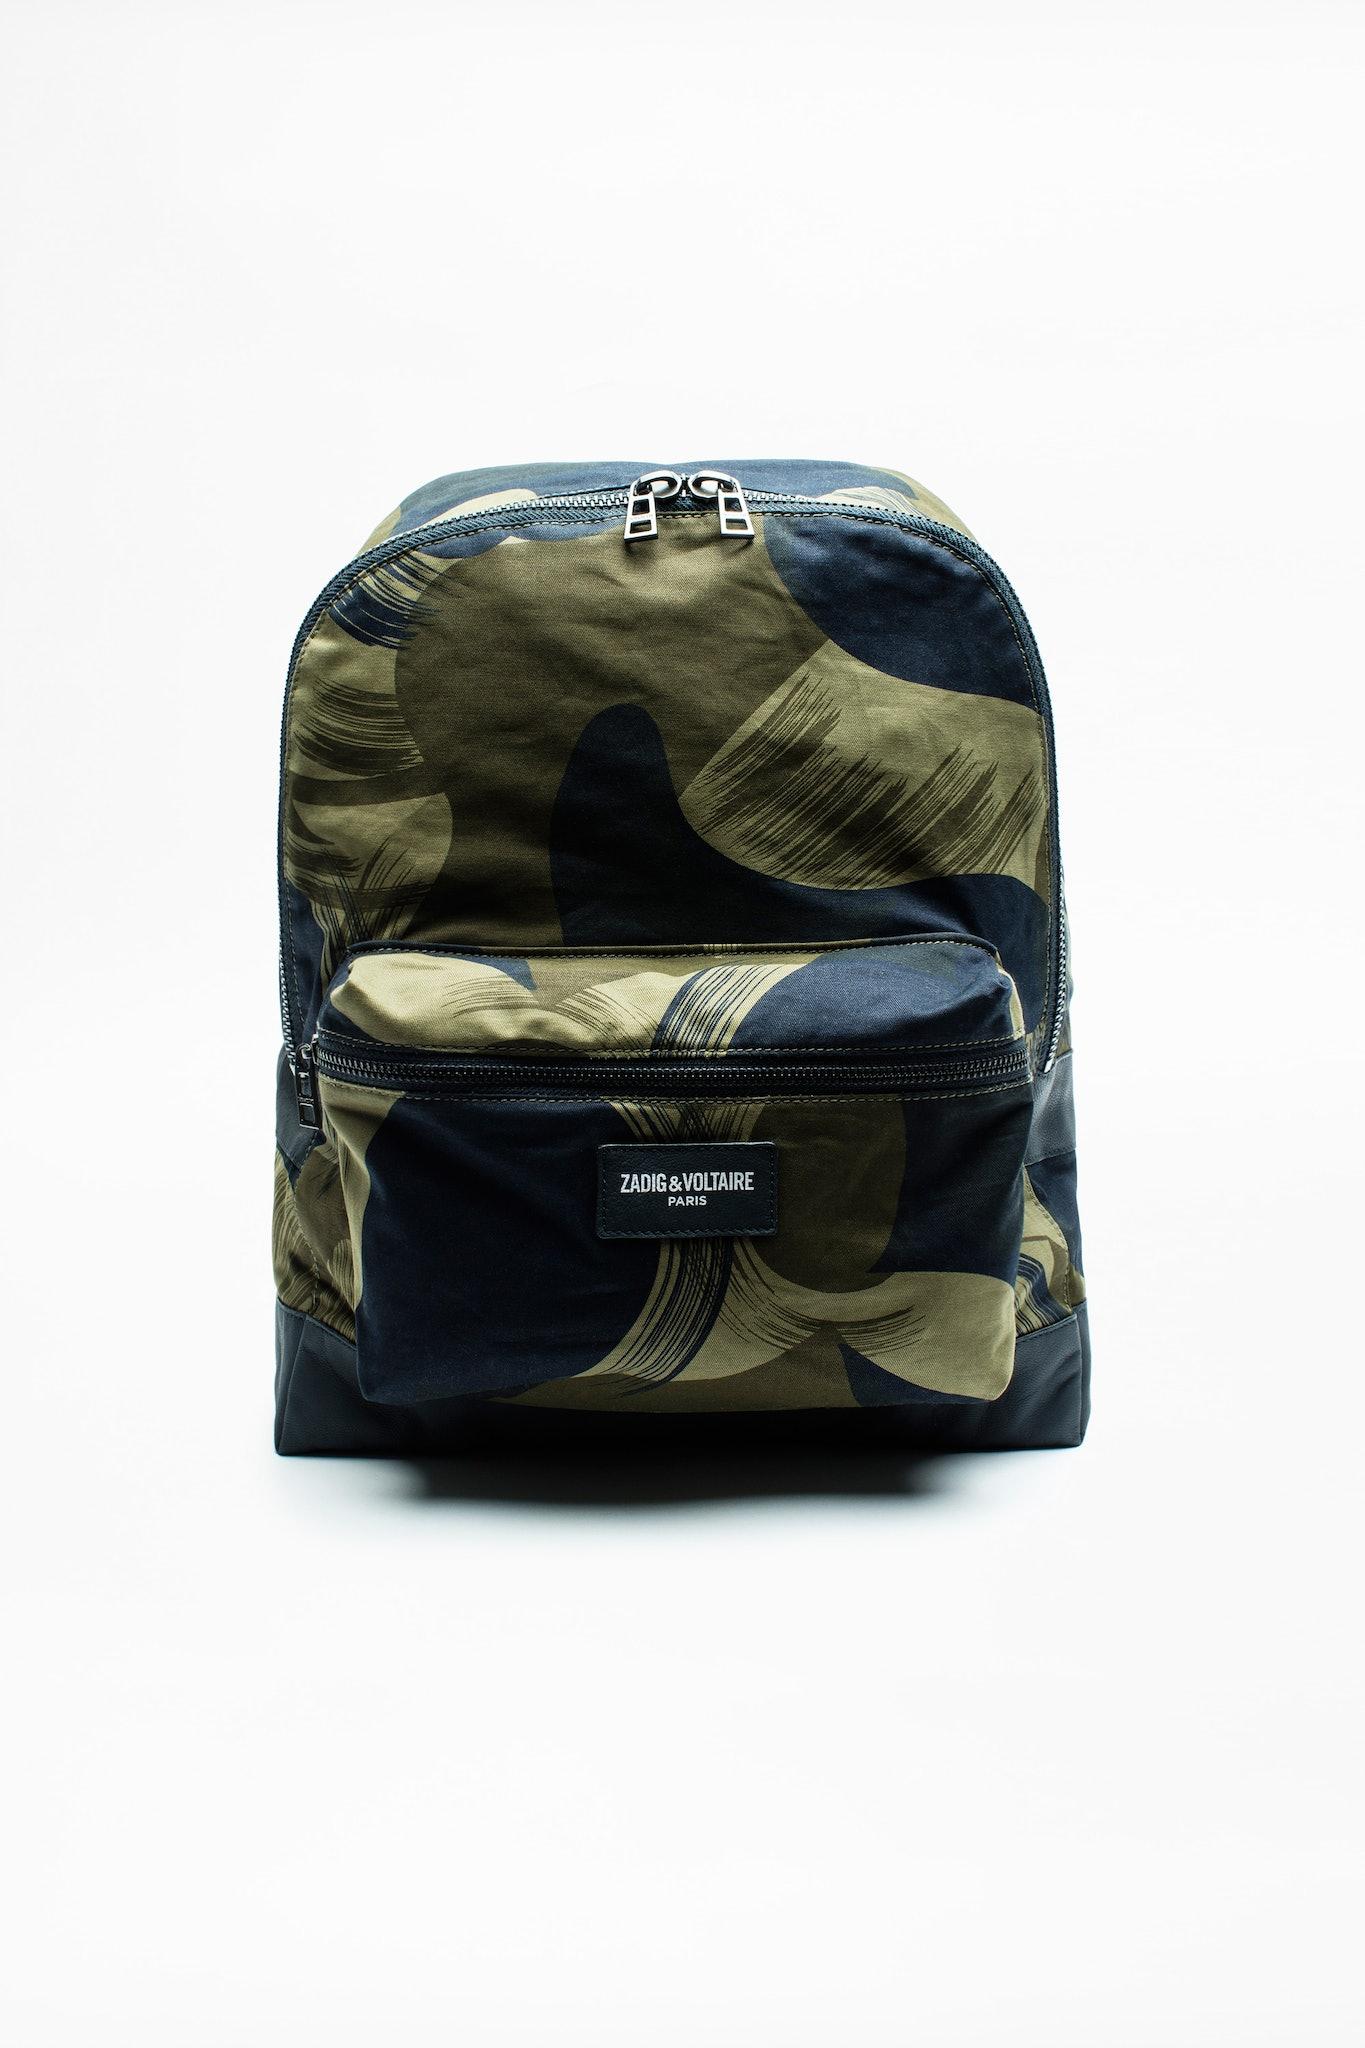 Jetlag Camou Bag